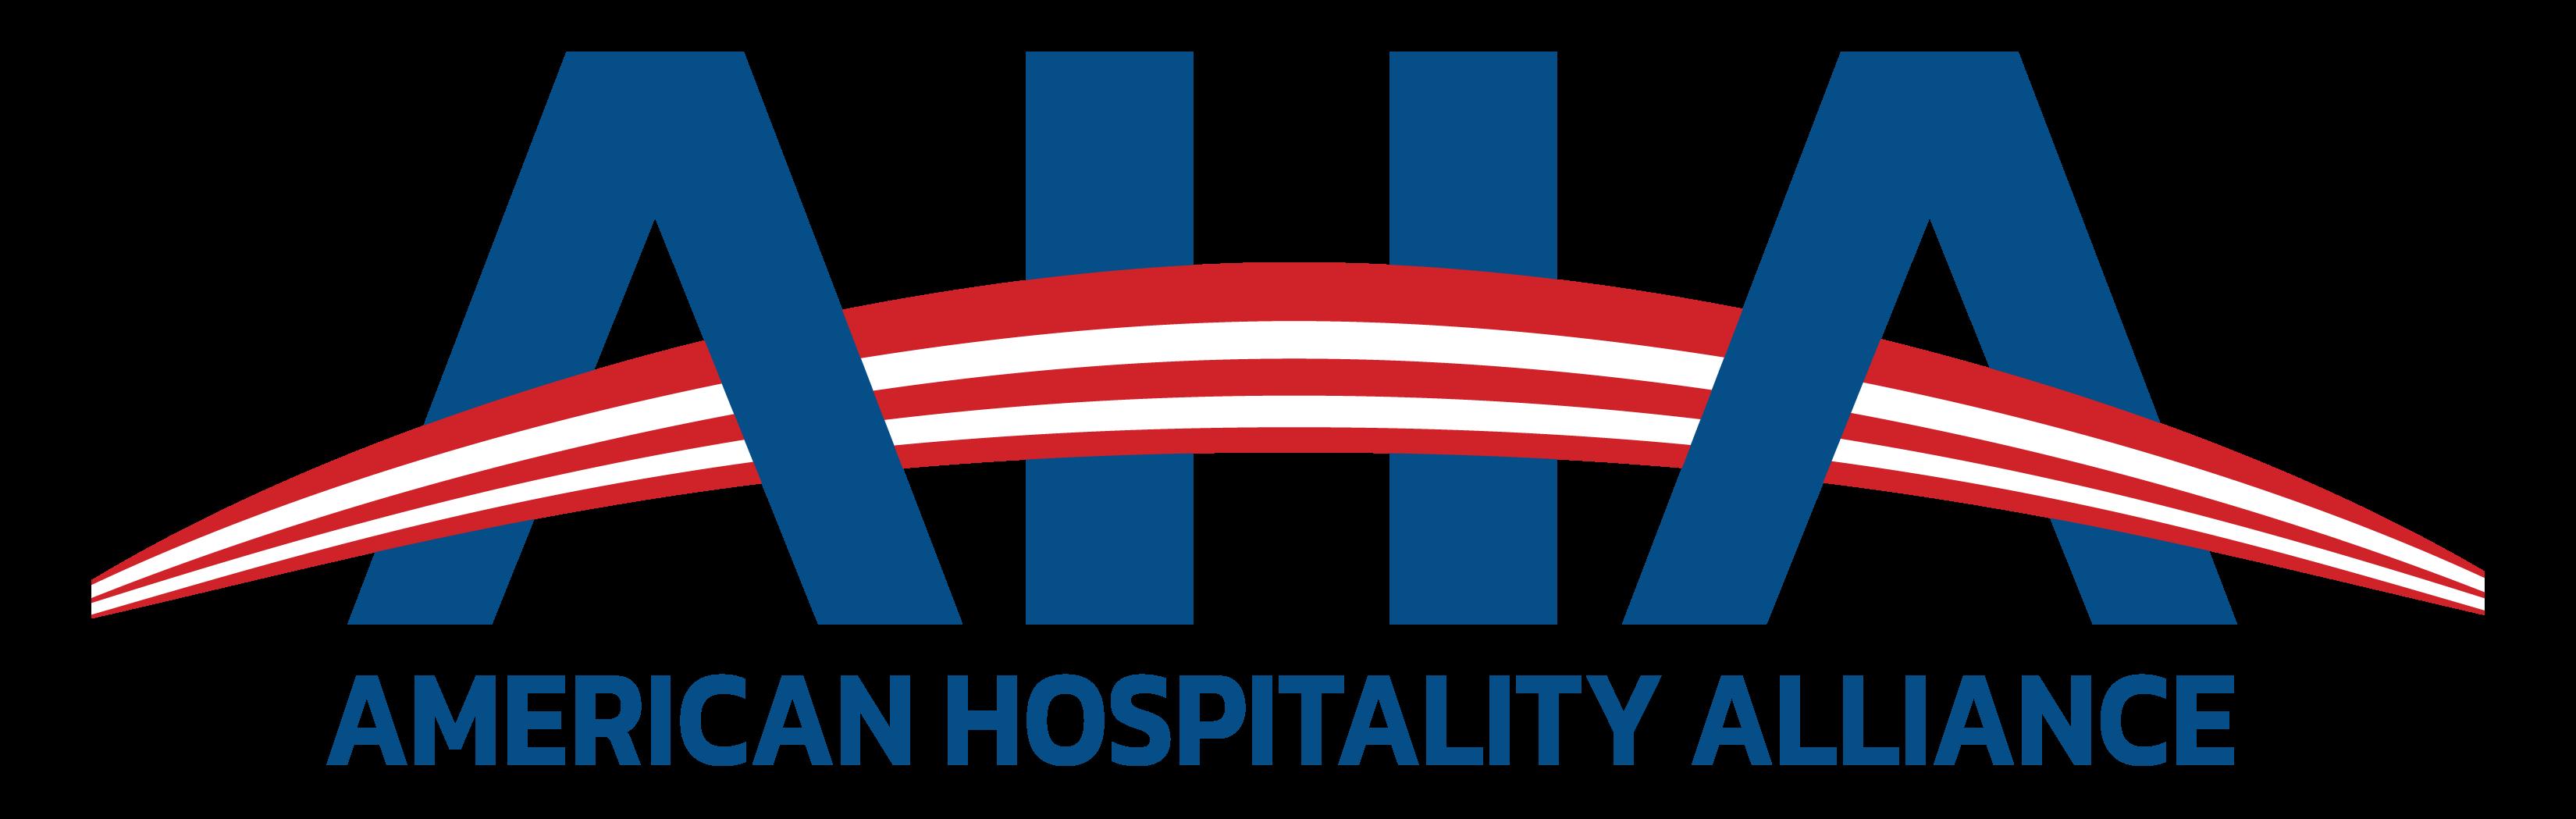 American Hospitality Alliance